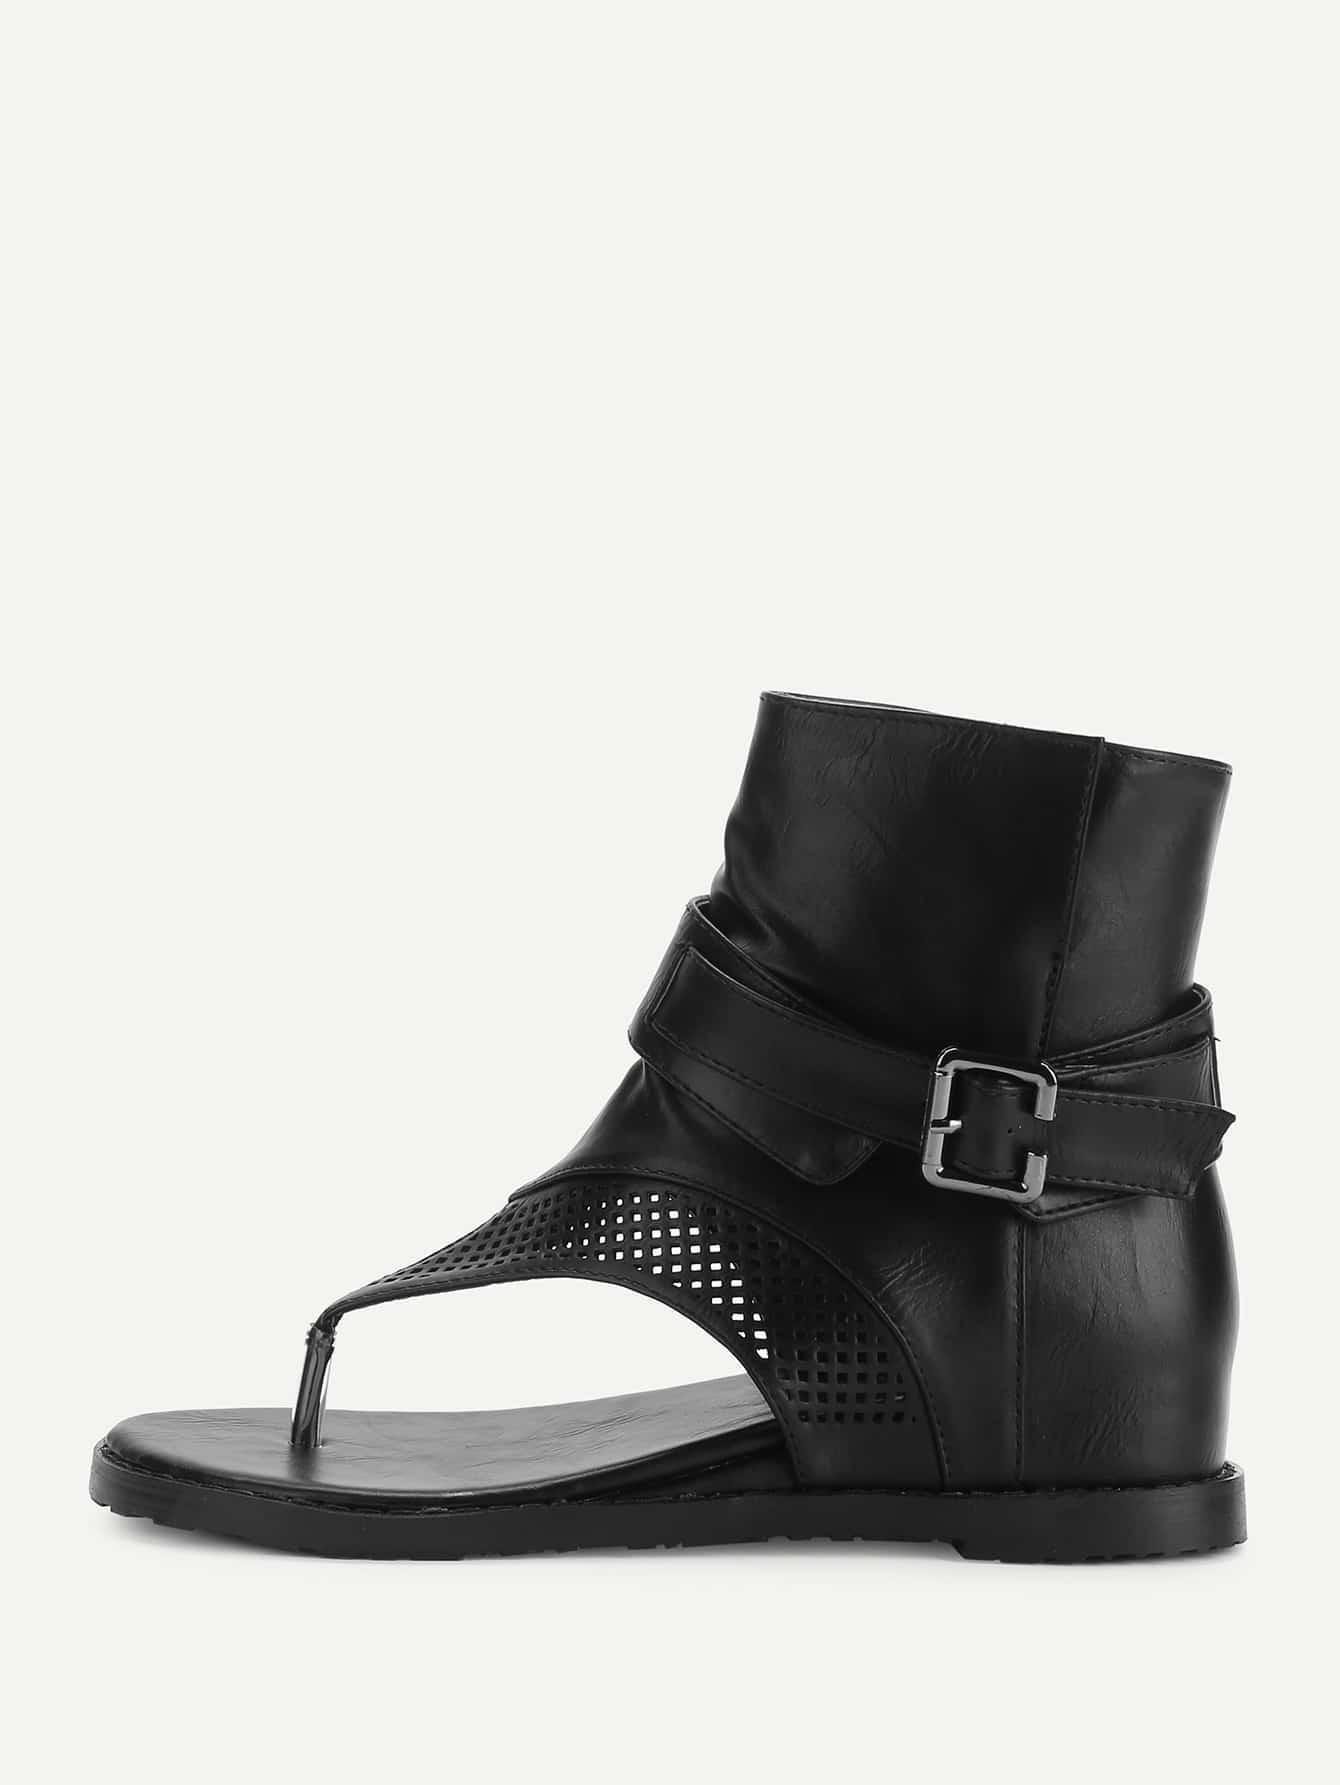 все цены на T-strap Buckle Detail Wedge Sandals